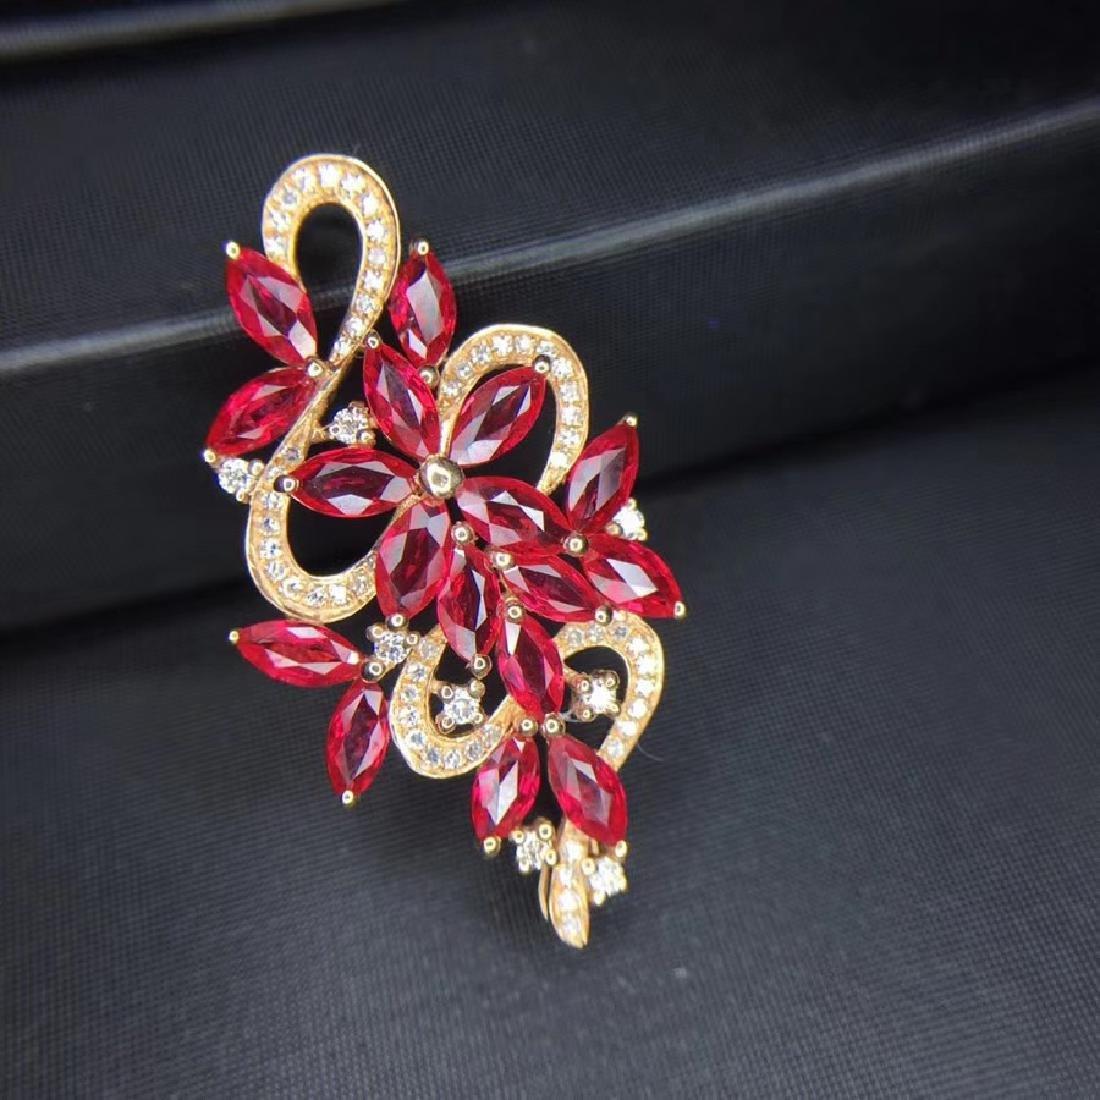 2.65 CTW Ruby & VS Diamond Ring 18K - 5